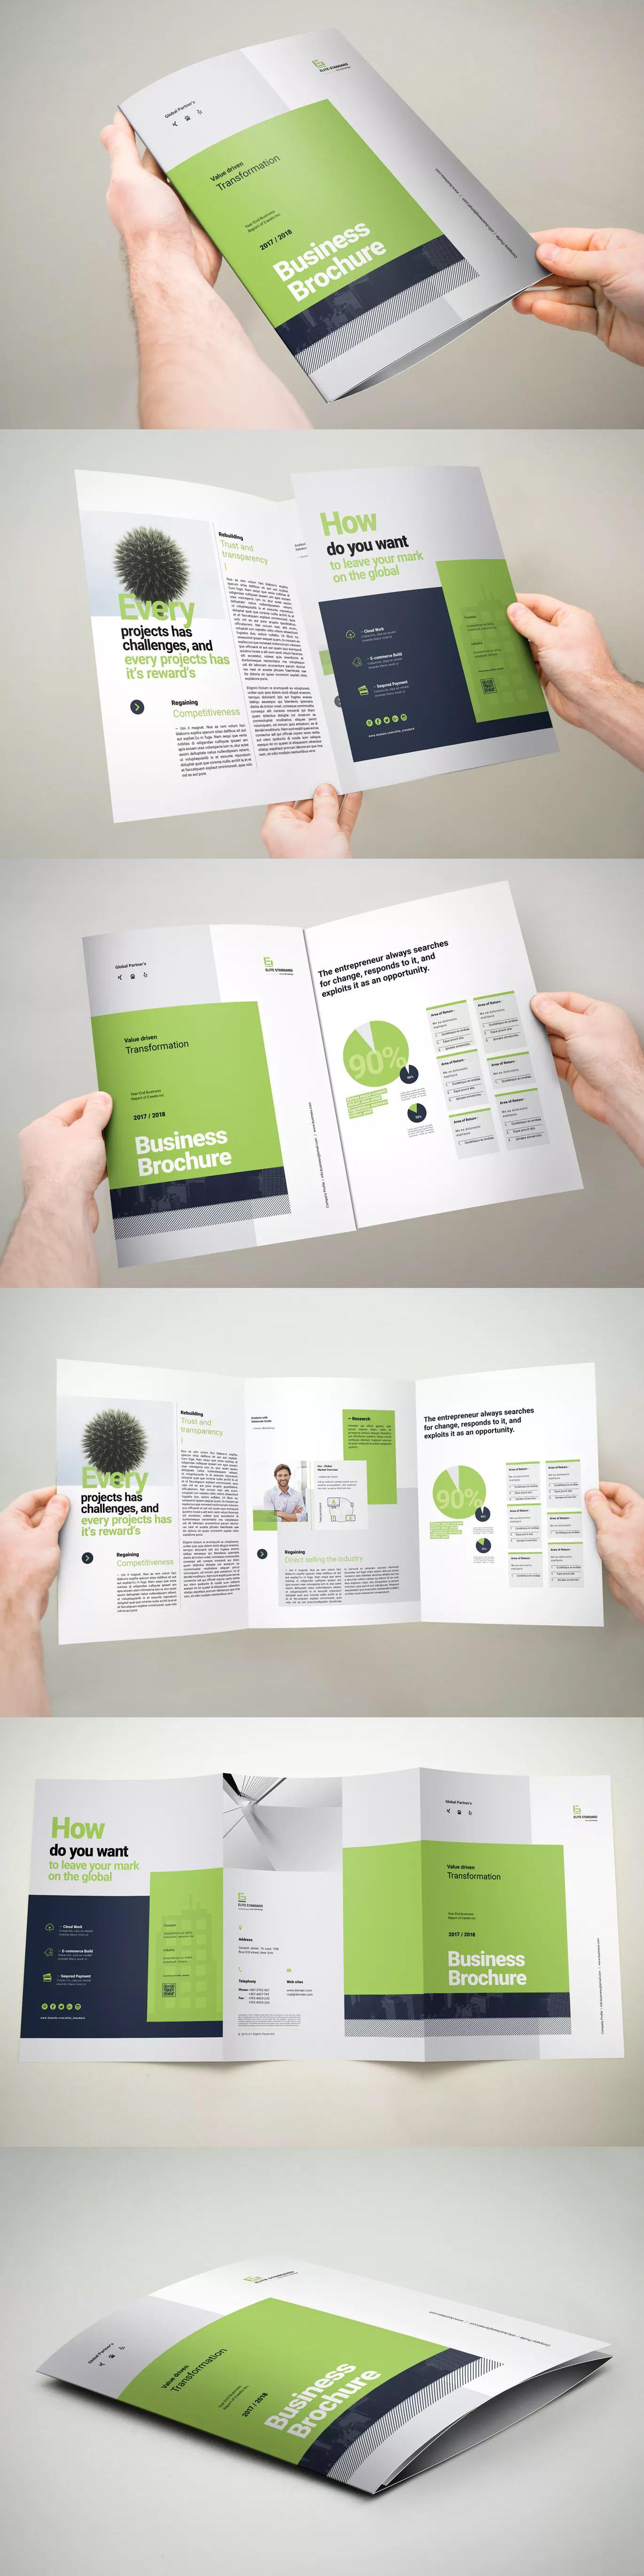 3xa4 Trifold Brochure By Ashuras Sharif On Envato Elements Trifold Brochure Brochure Design Template Brochure Template A4 tri fold brochure template